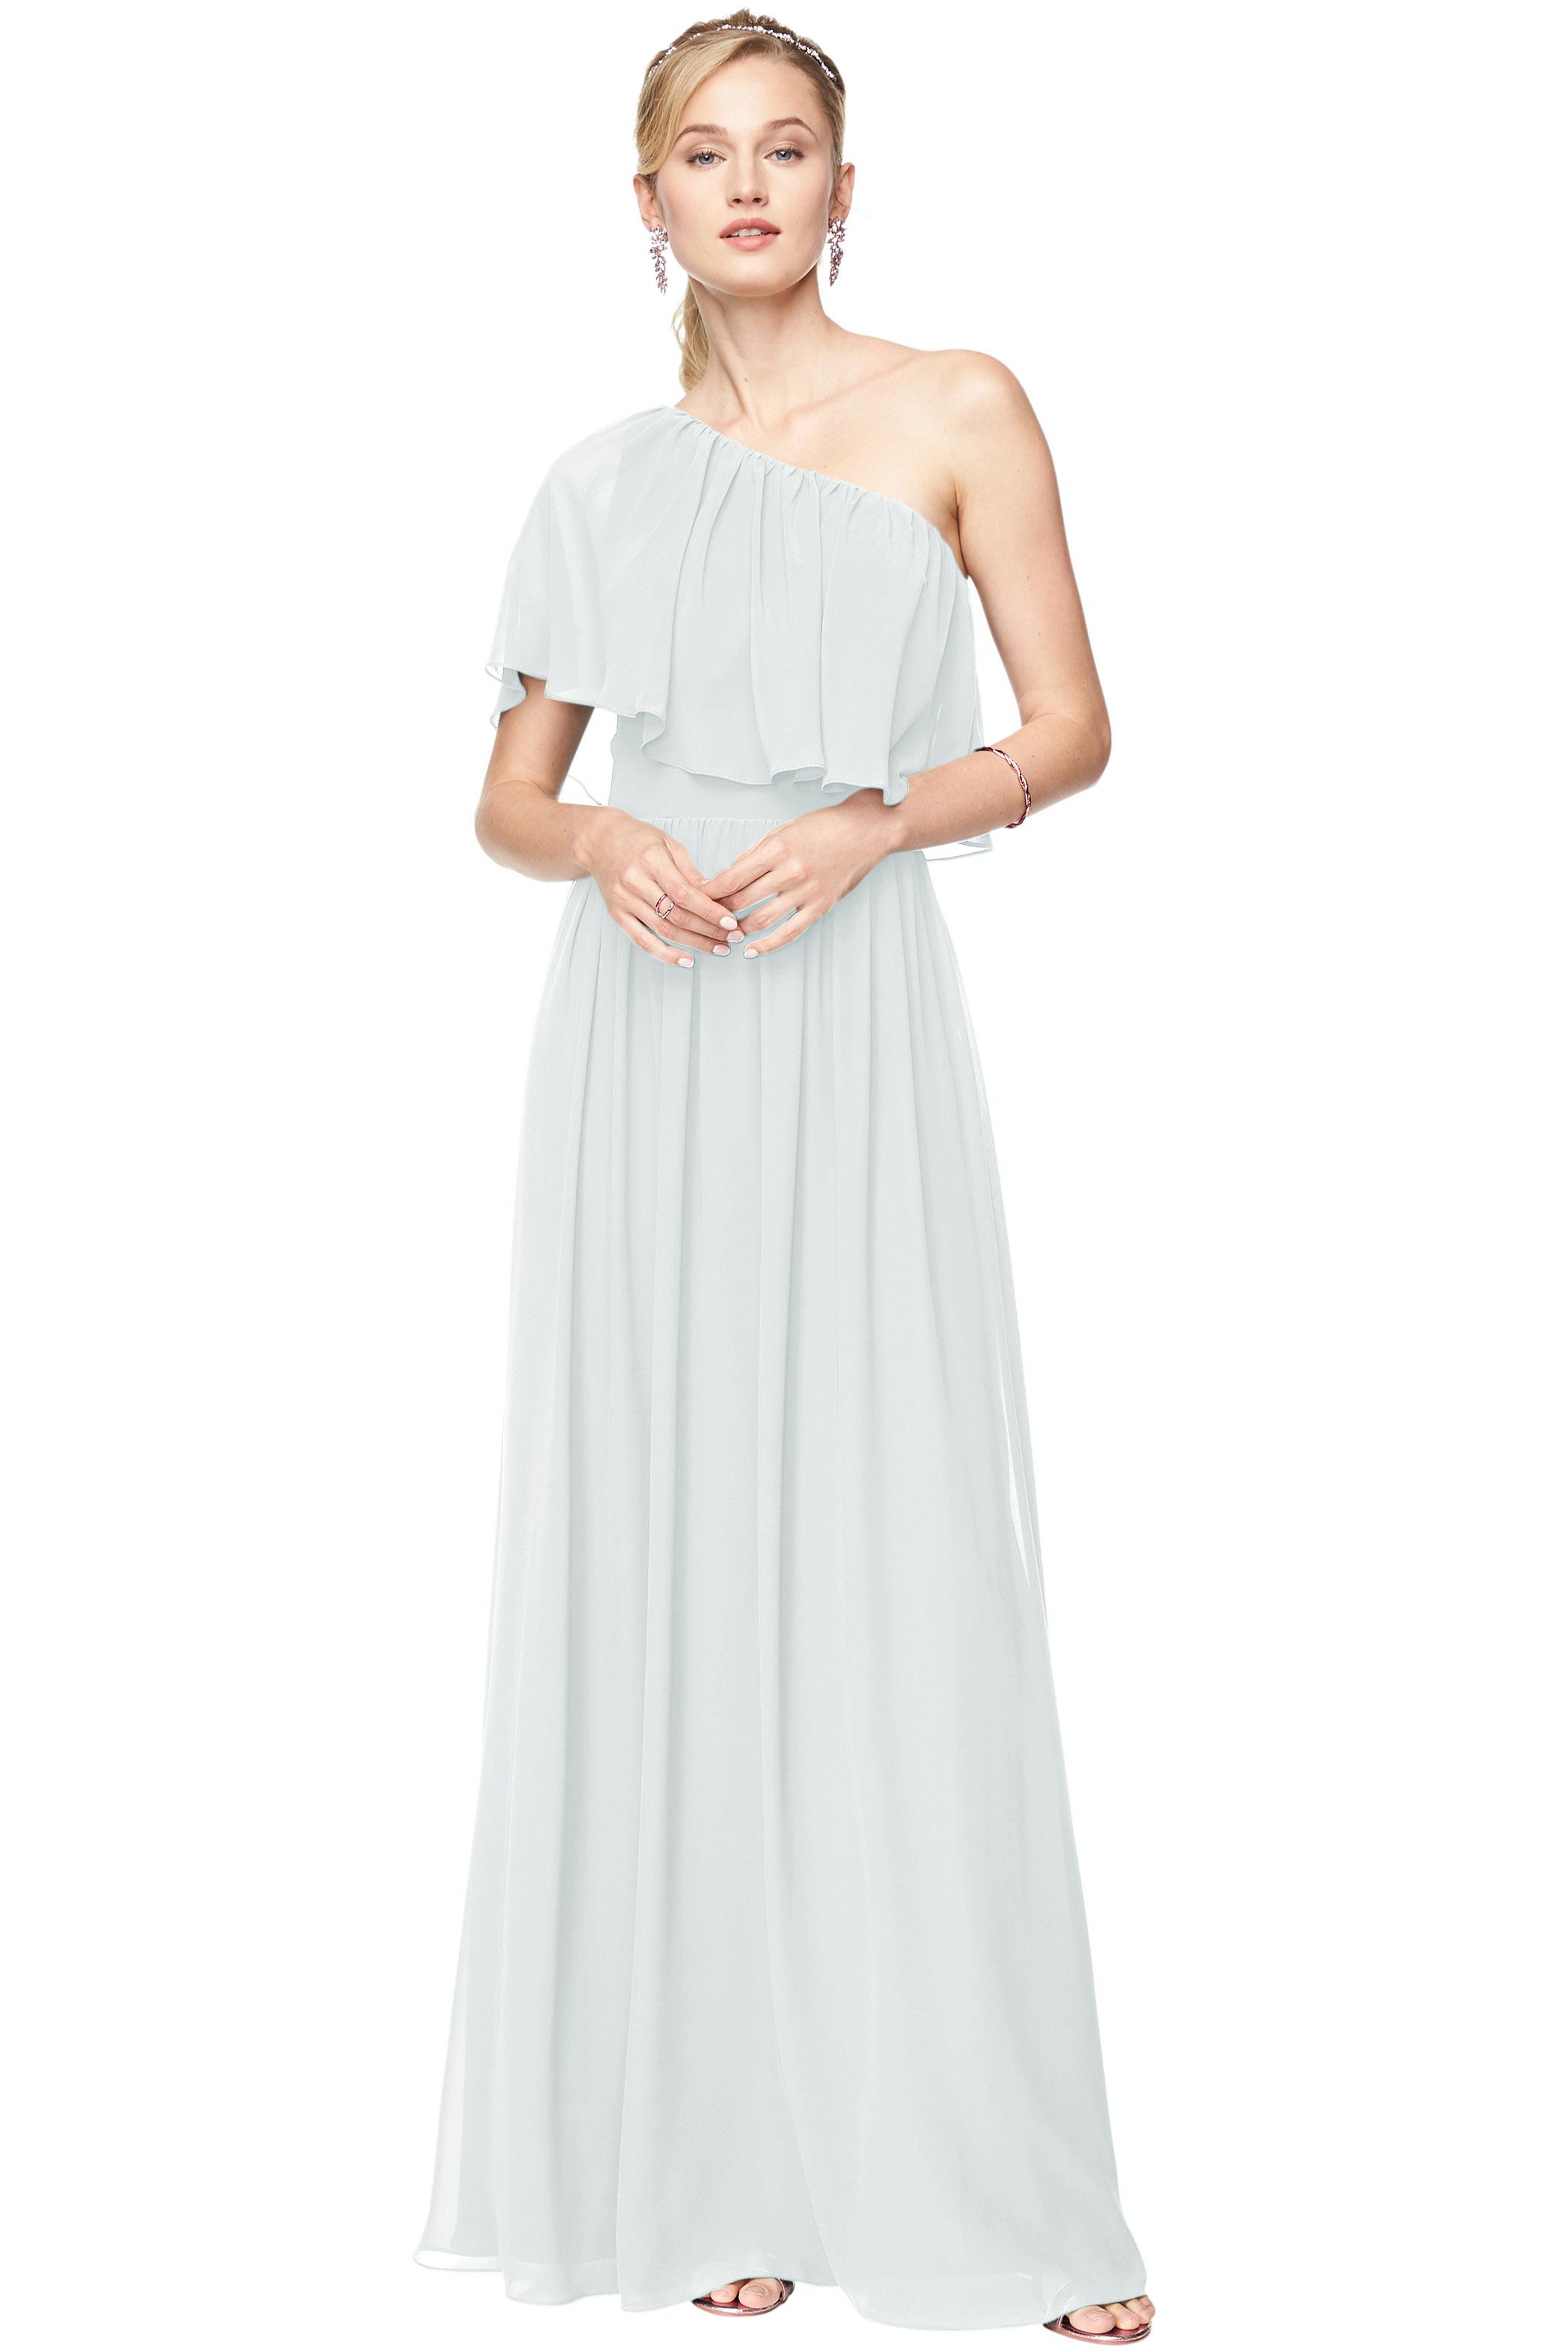 Bill Levkoff MIST Chiffon One Shoulder A-Line gown, $184.00 Front